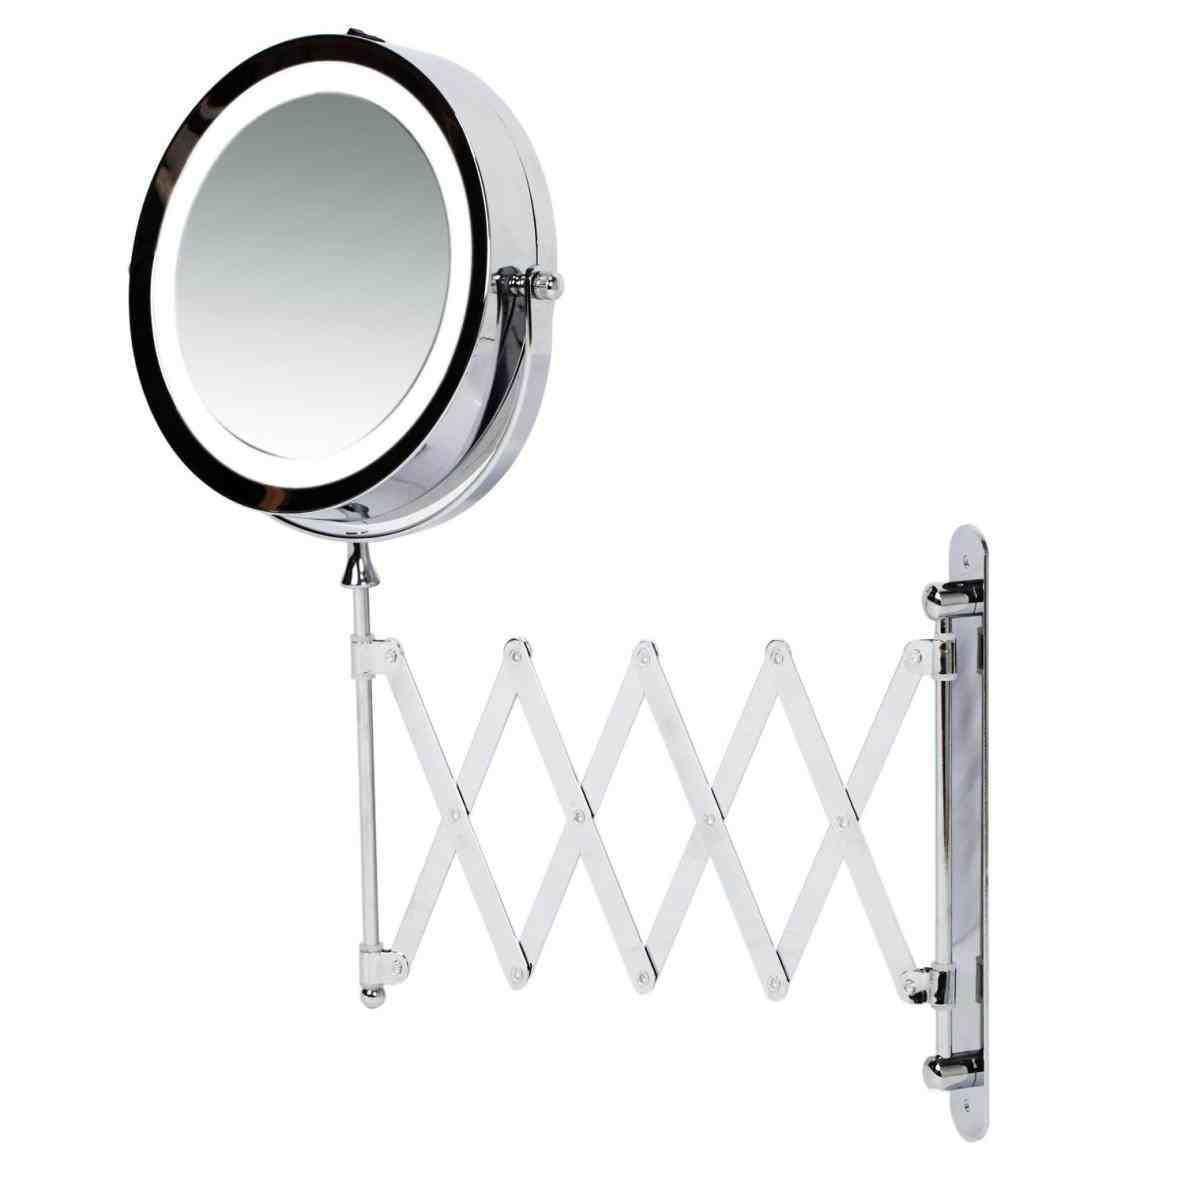 New Post extending magnifying bathroom mirror | LivingRooms ...